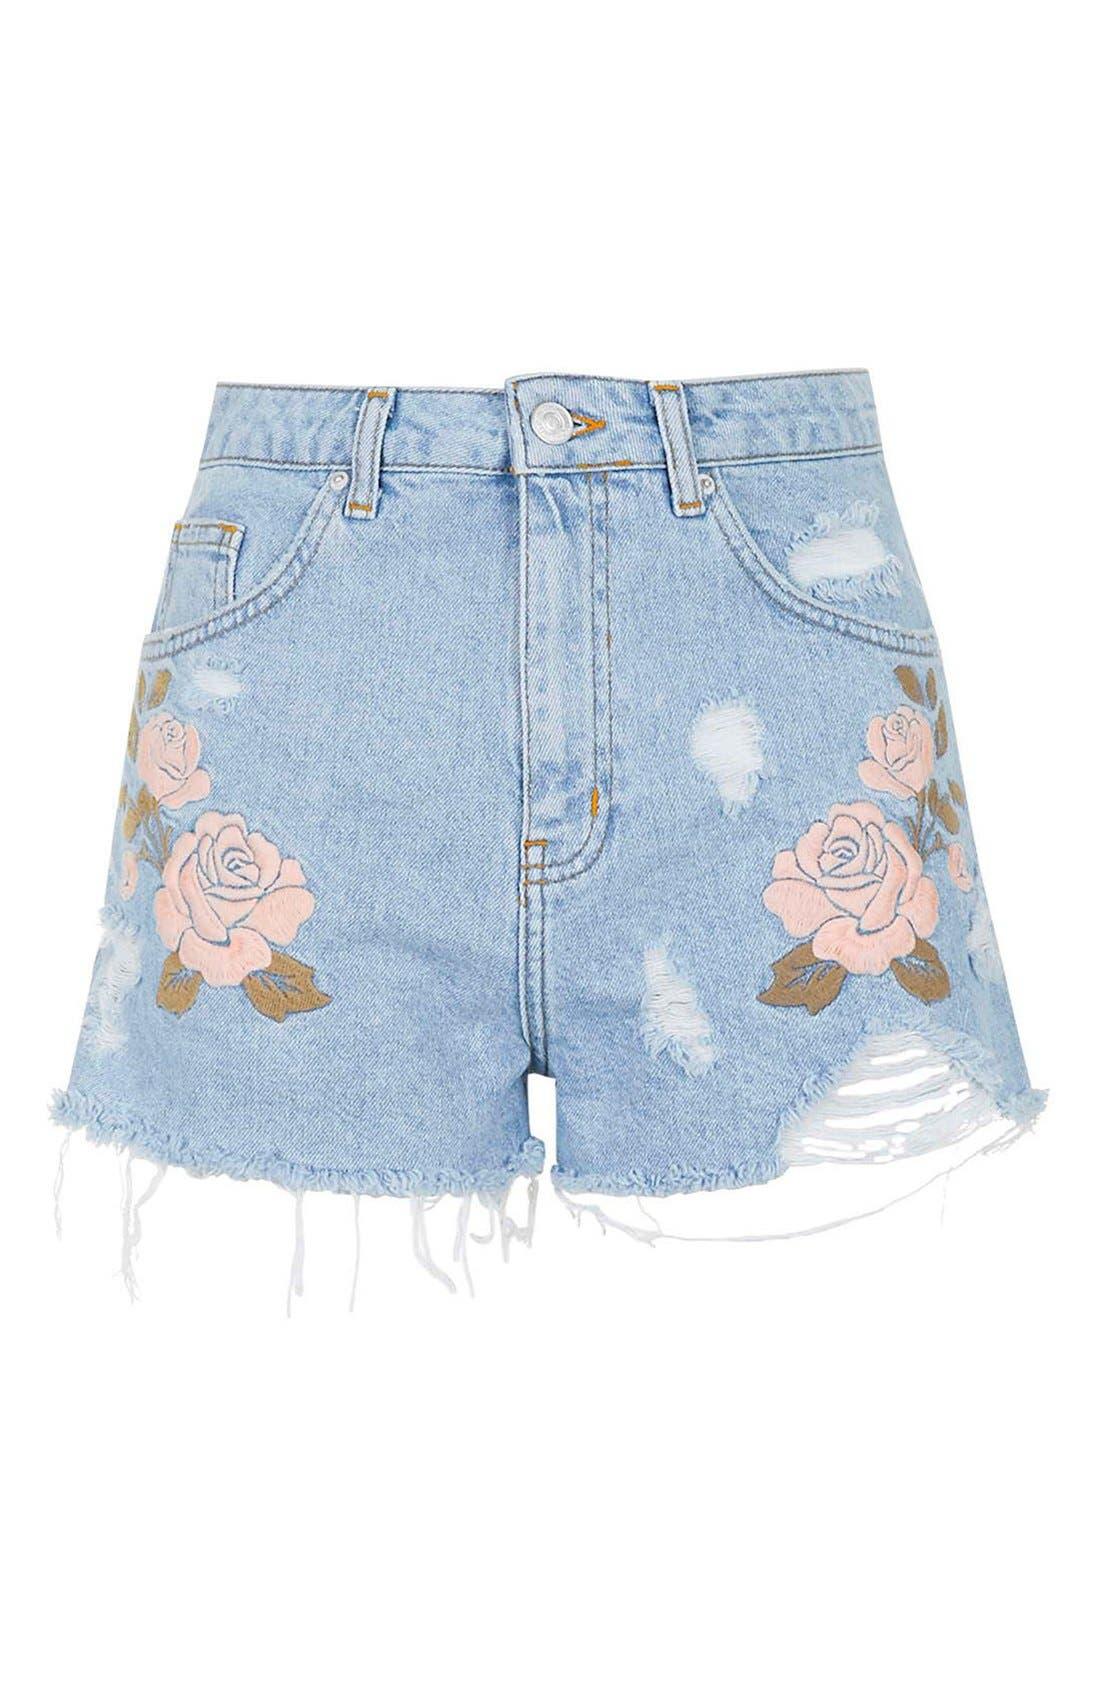 Alternate Image 3  - Topshop Moto Floral Embroidered Cutoff Denim Shorts (Light Denim)